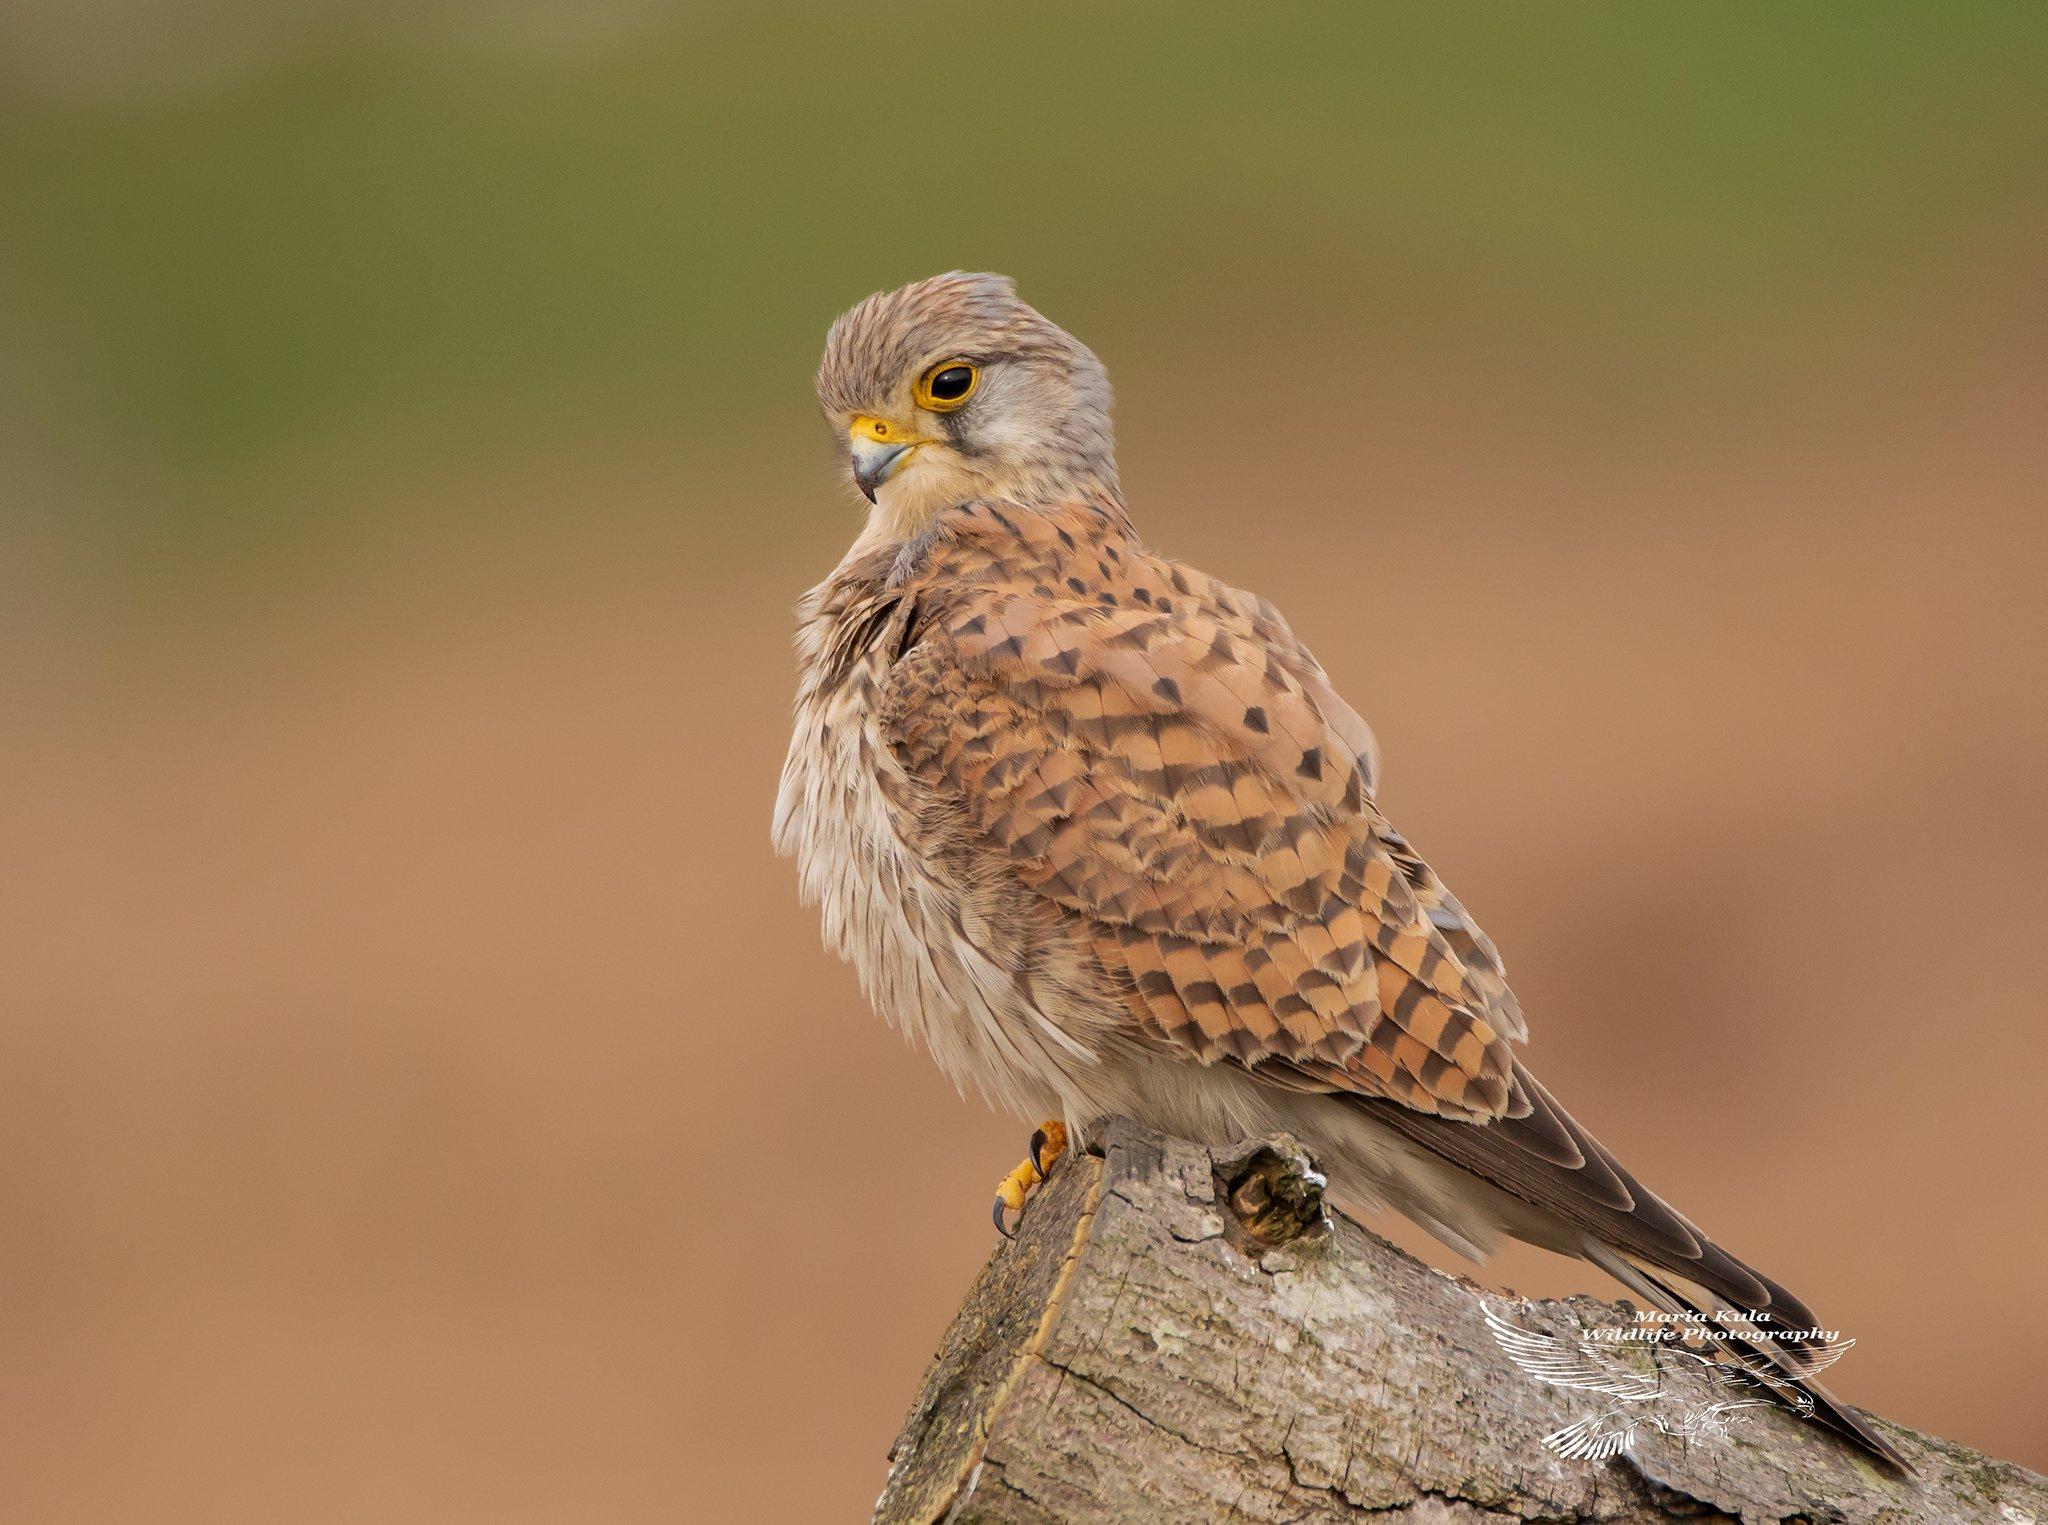 kesstrel, birds, birds of prey, nature, wildlife, woods, land, MARIA KULA